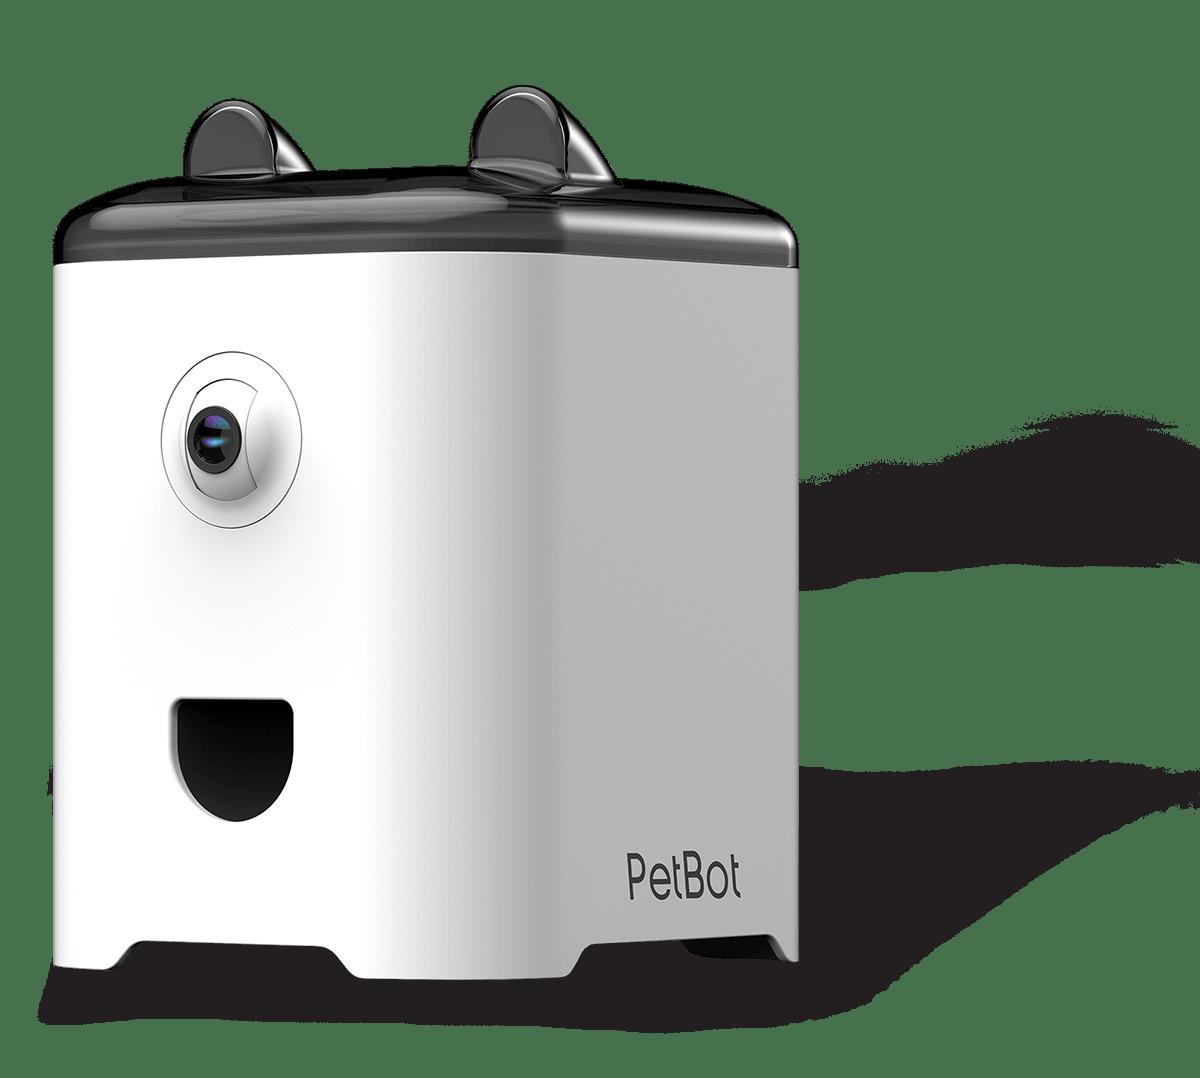 petbot